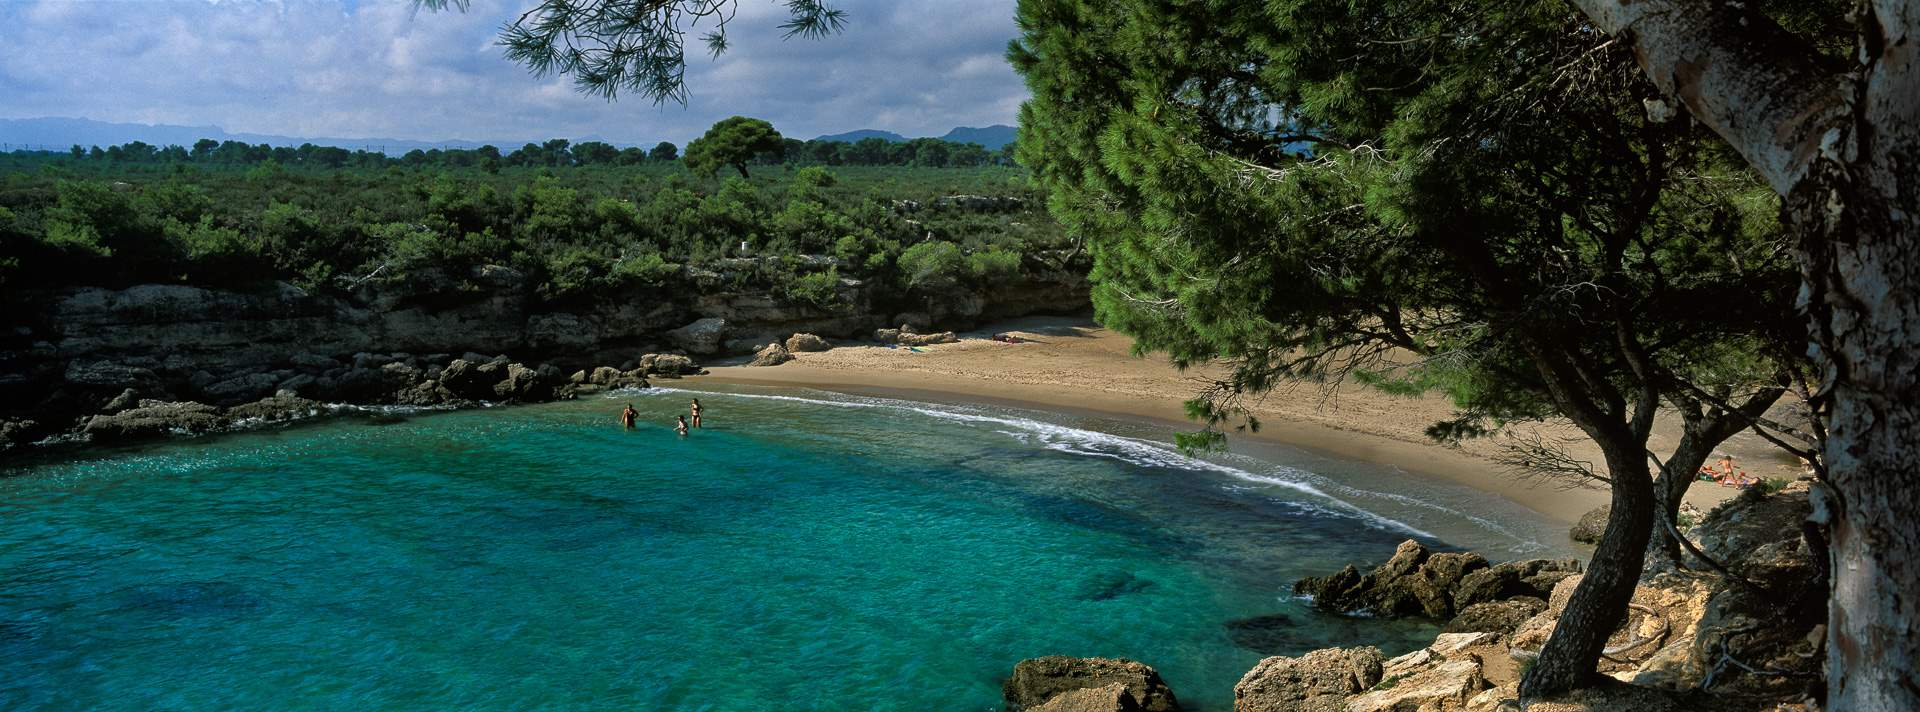 gr92 platja. Playas singulares